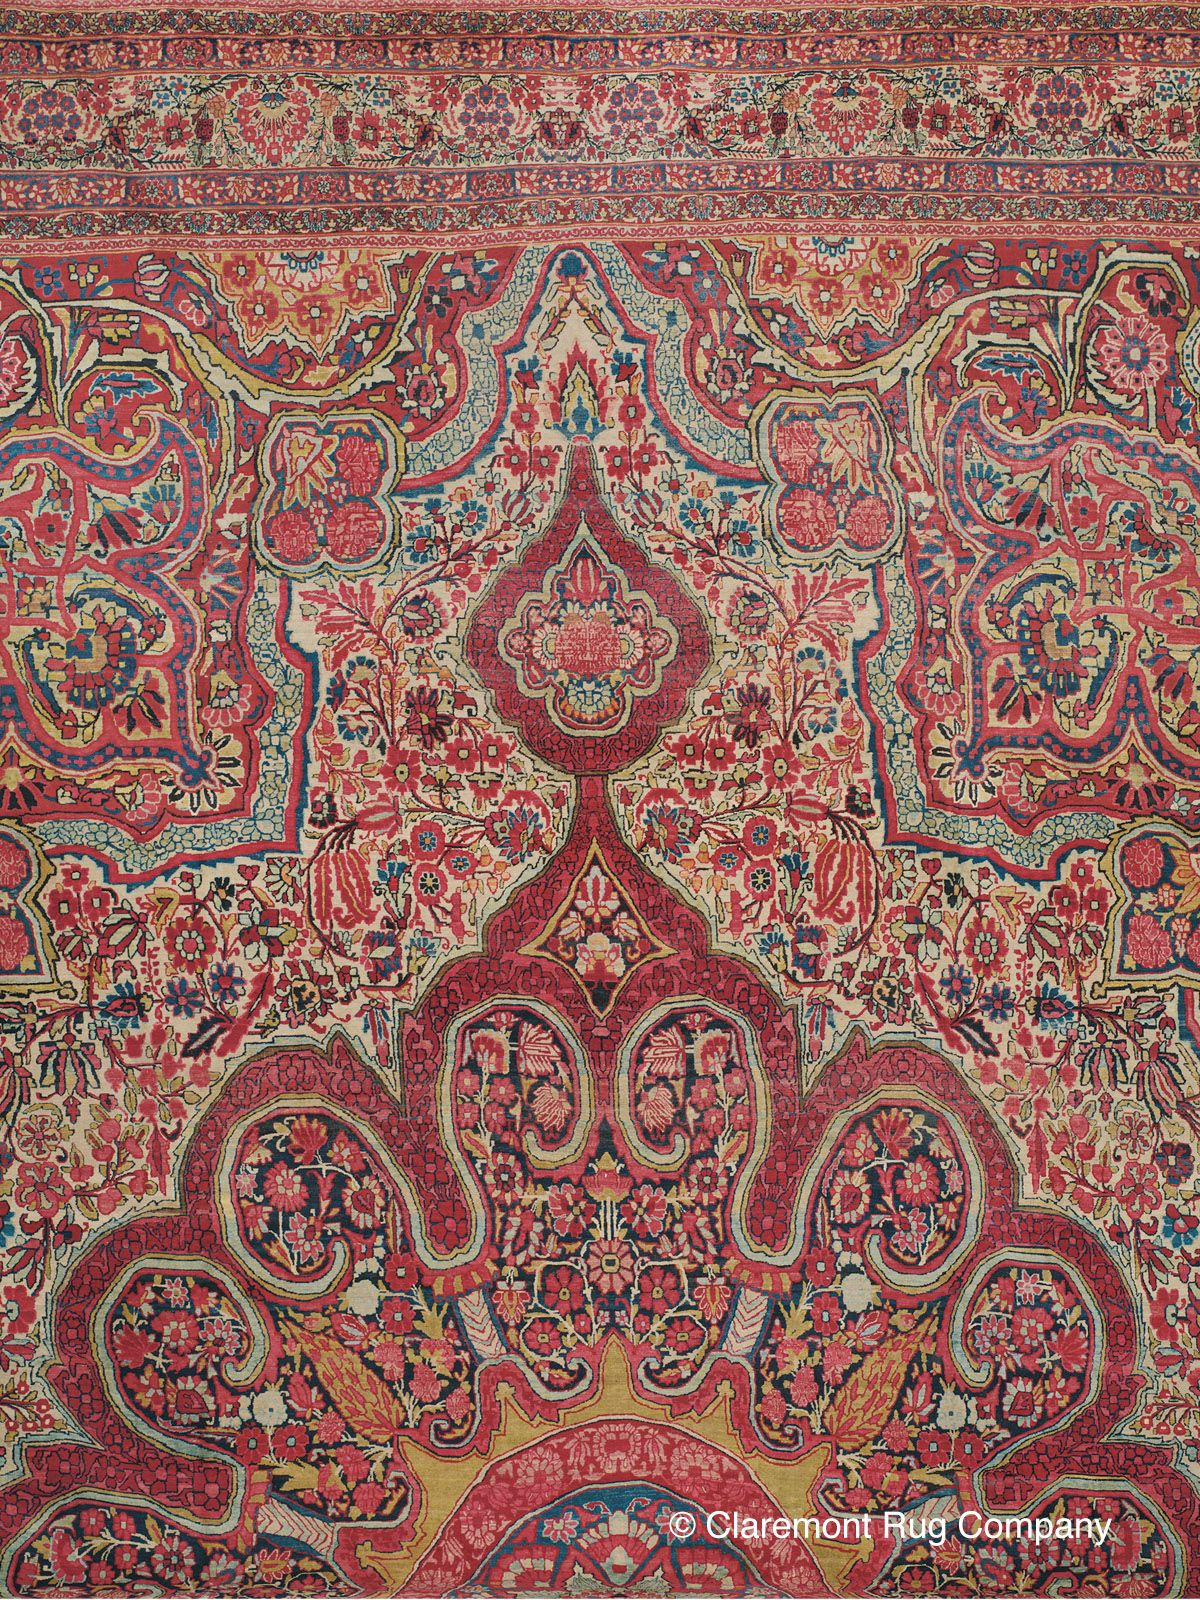 Laver Kirman Southeast Persian Antique Rug 17 0 X 24 6 Circa 1900 Claremont Rug Company Claremont Rug Company Mughal Paintings Rugs On Carpet